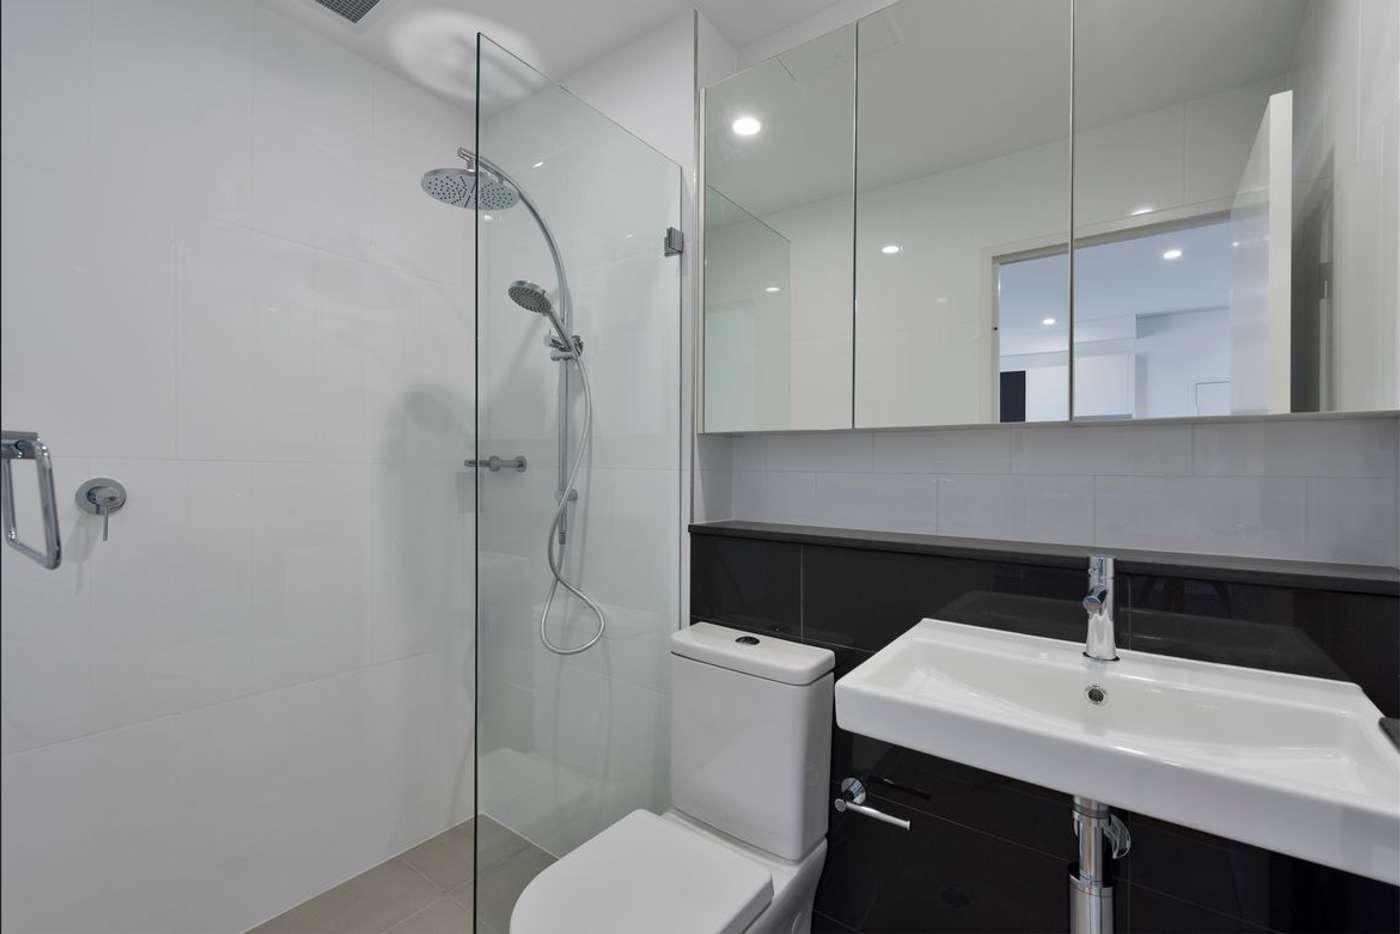 Main view of Homely apartment listing, 1.07/29-33 Birmingham Street, Alexandria NSW 2015